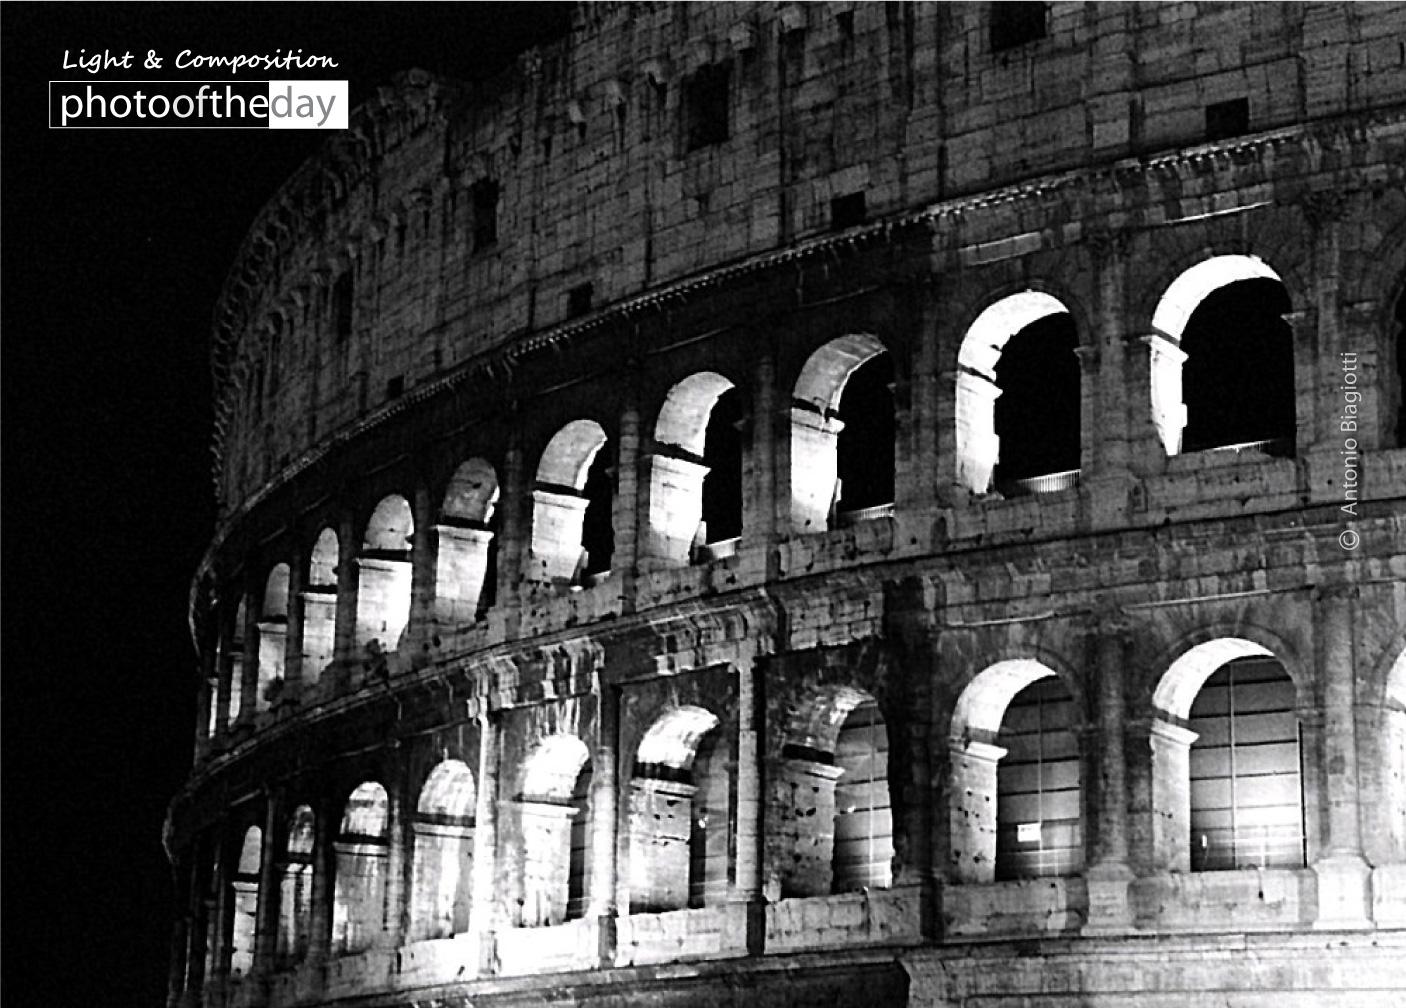 Colosseo by Antonio Biagiotti